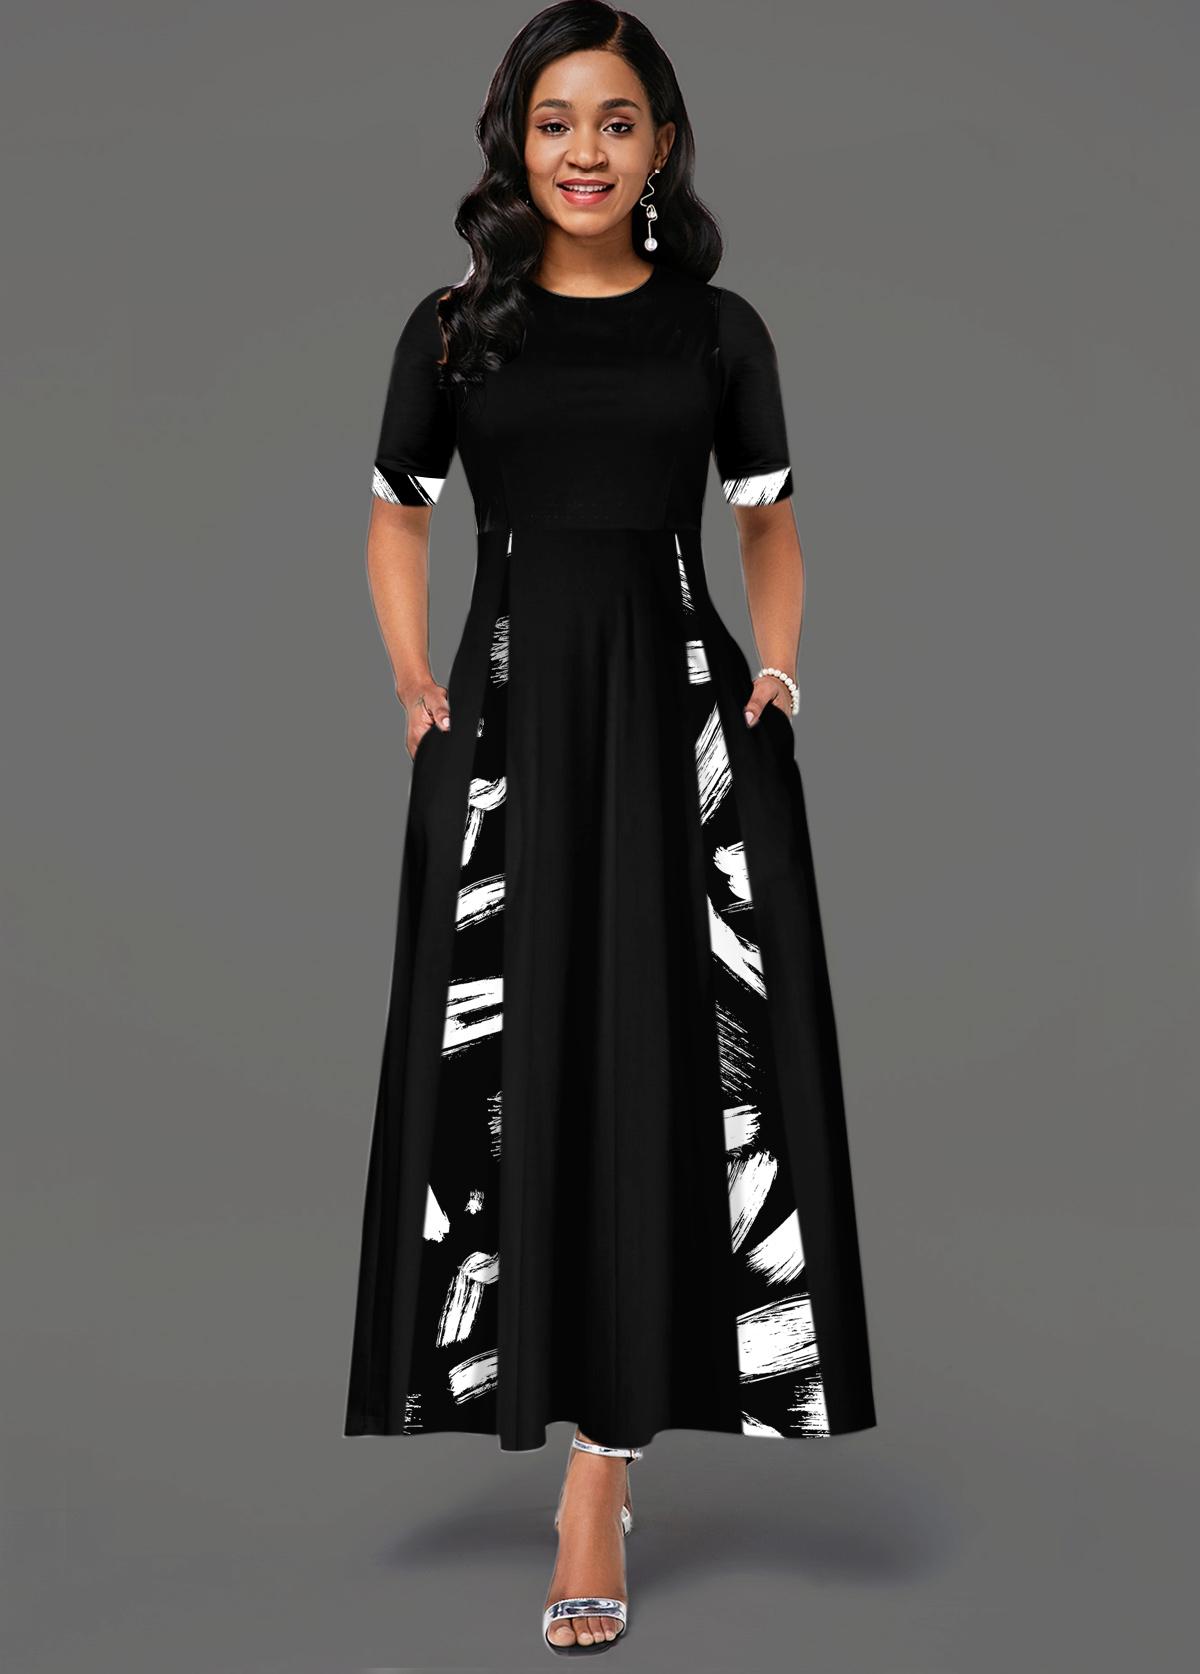 ROTITA Printed Short Sleeve Round Neck Pocket Dress